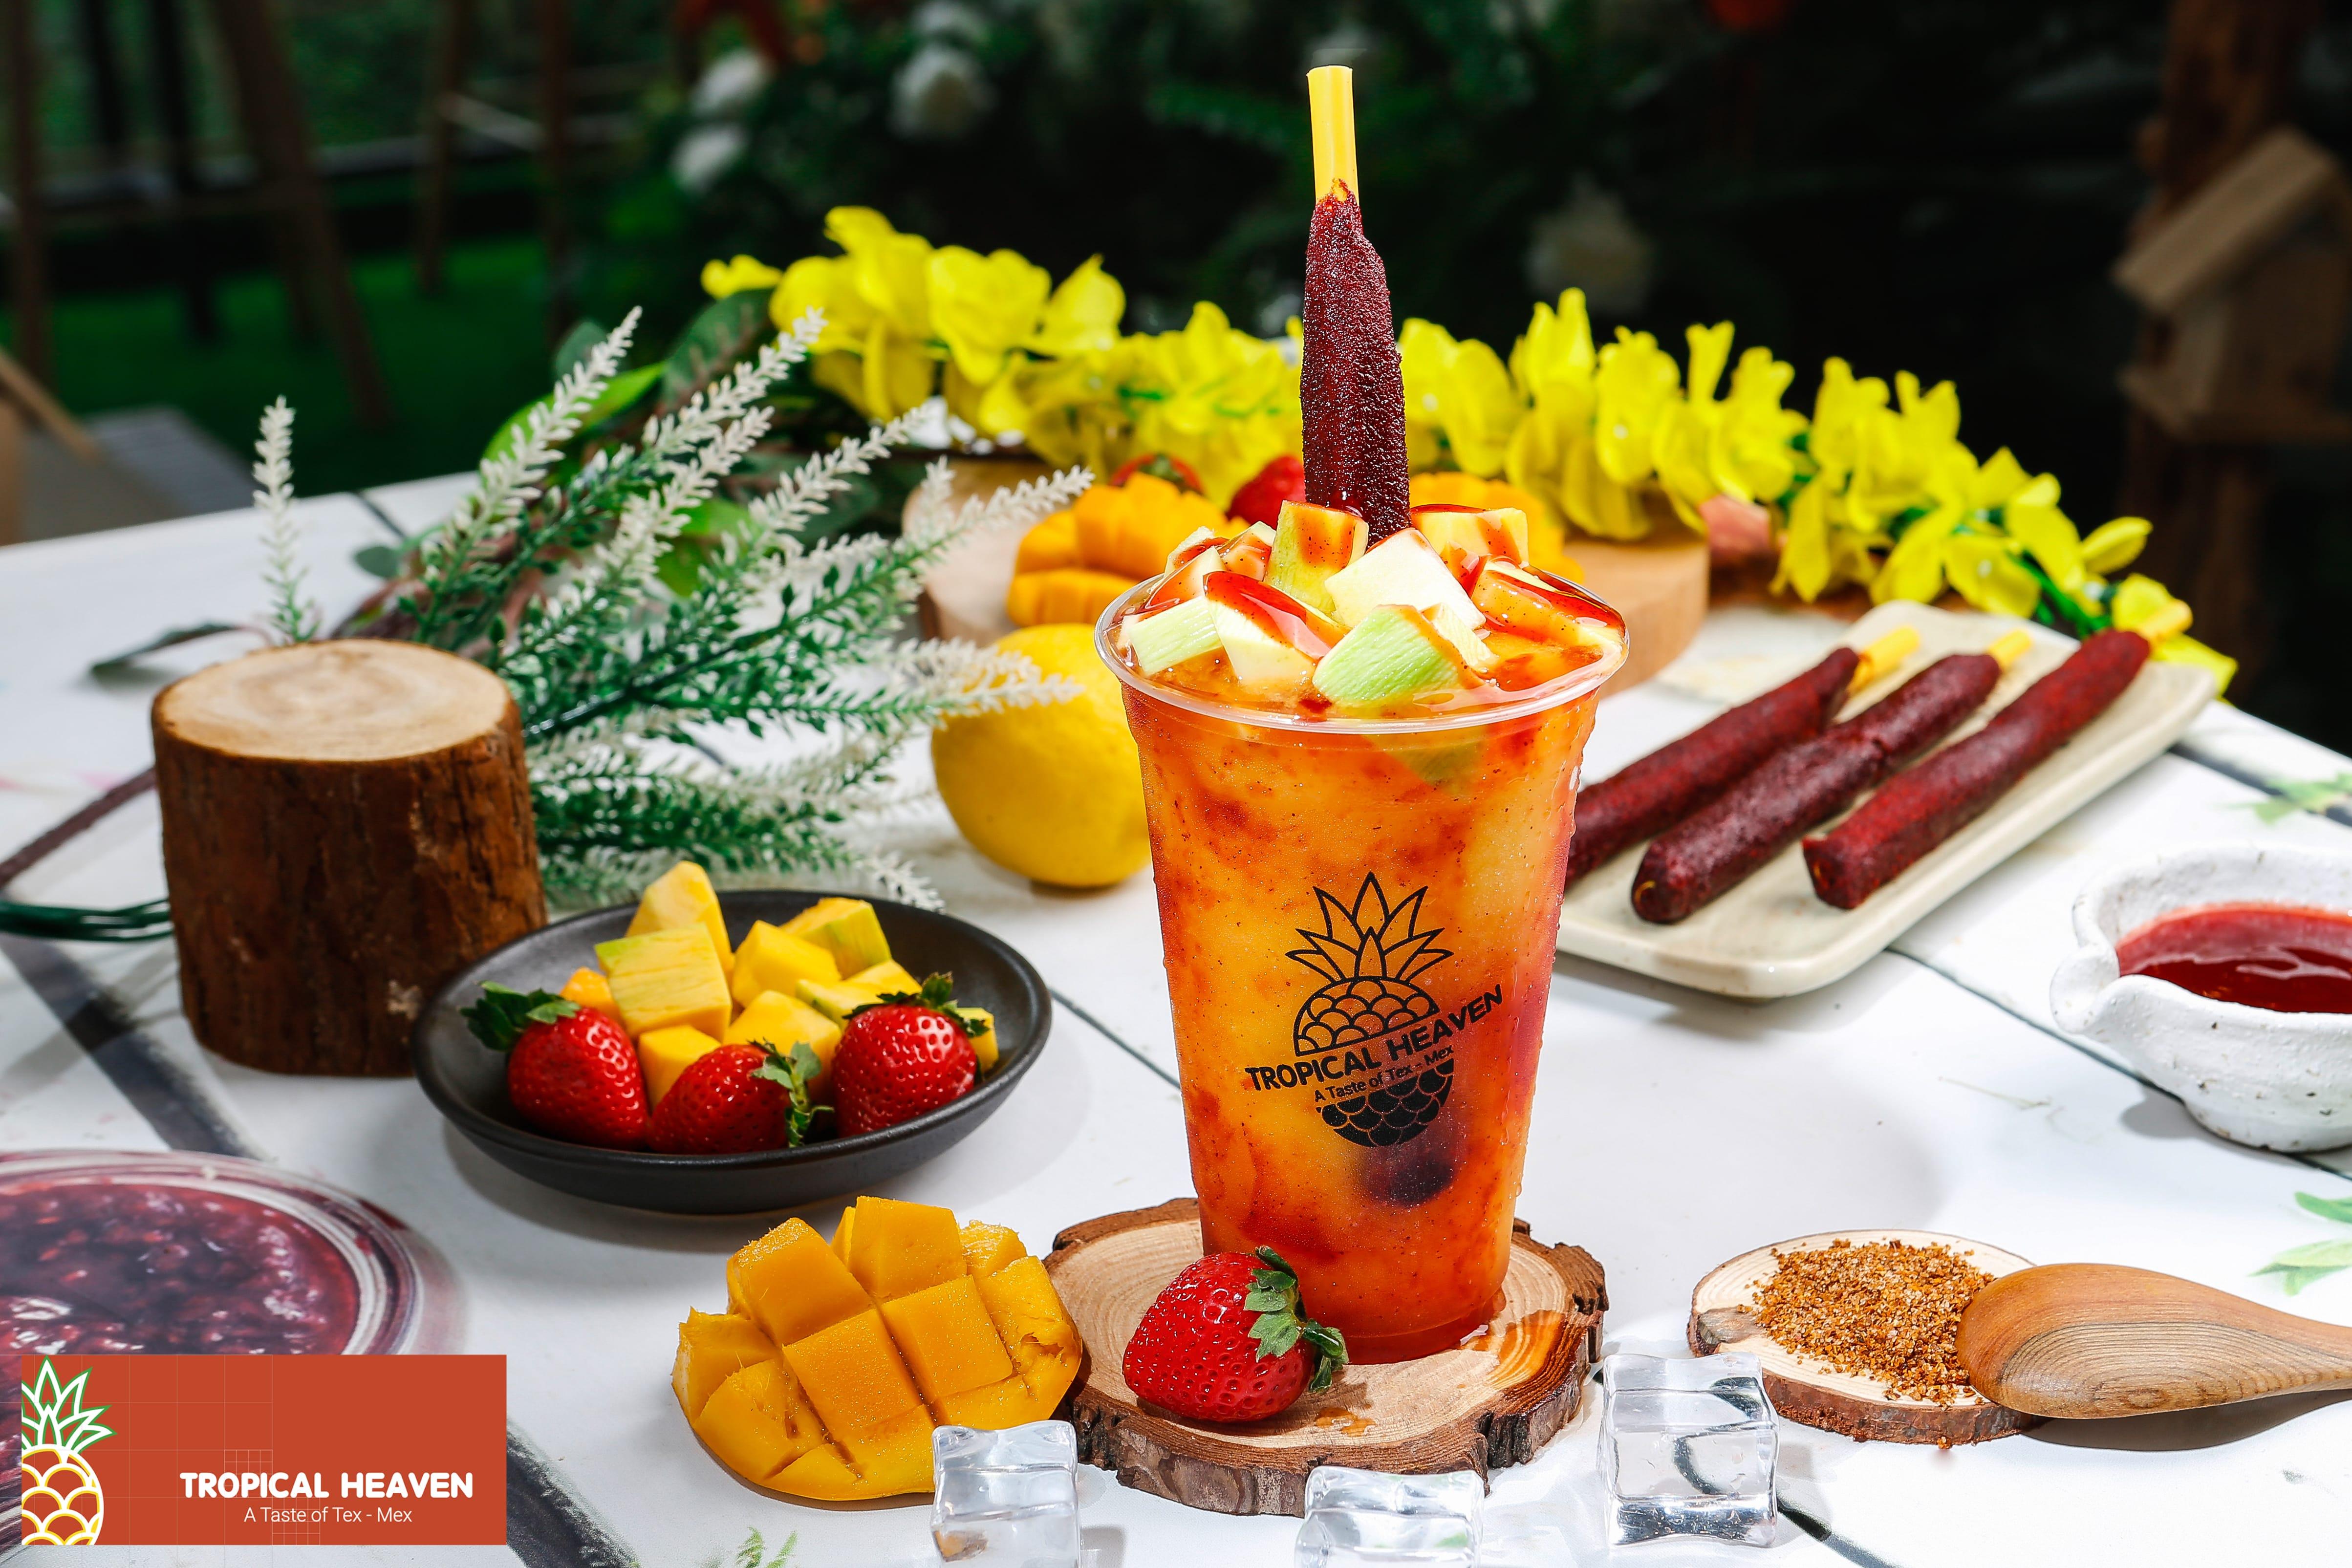 Spicy Mango Tropical Heaven